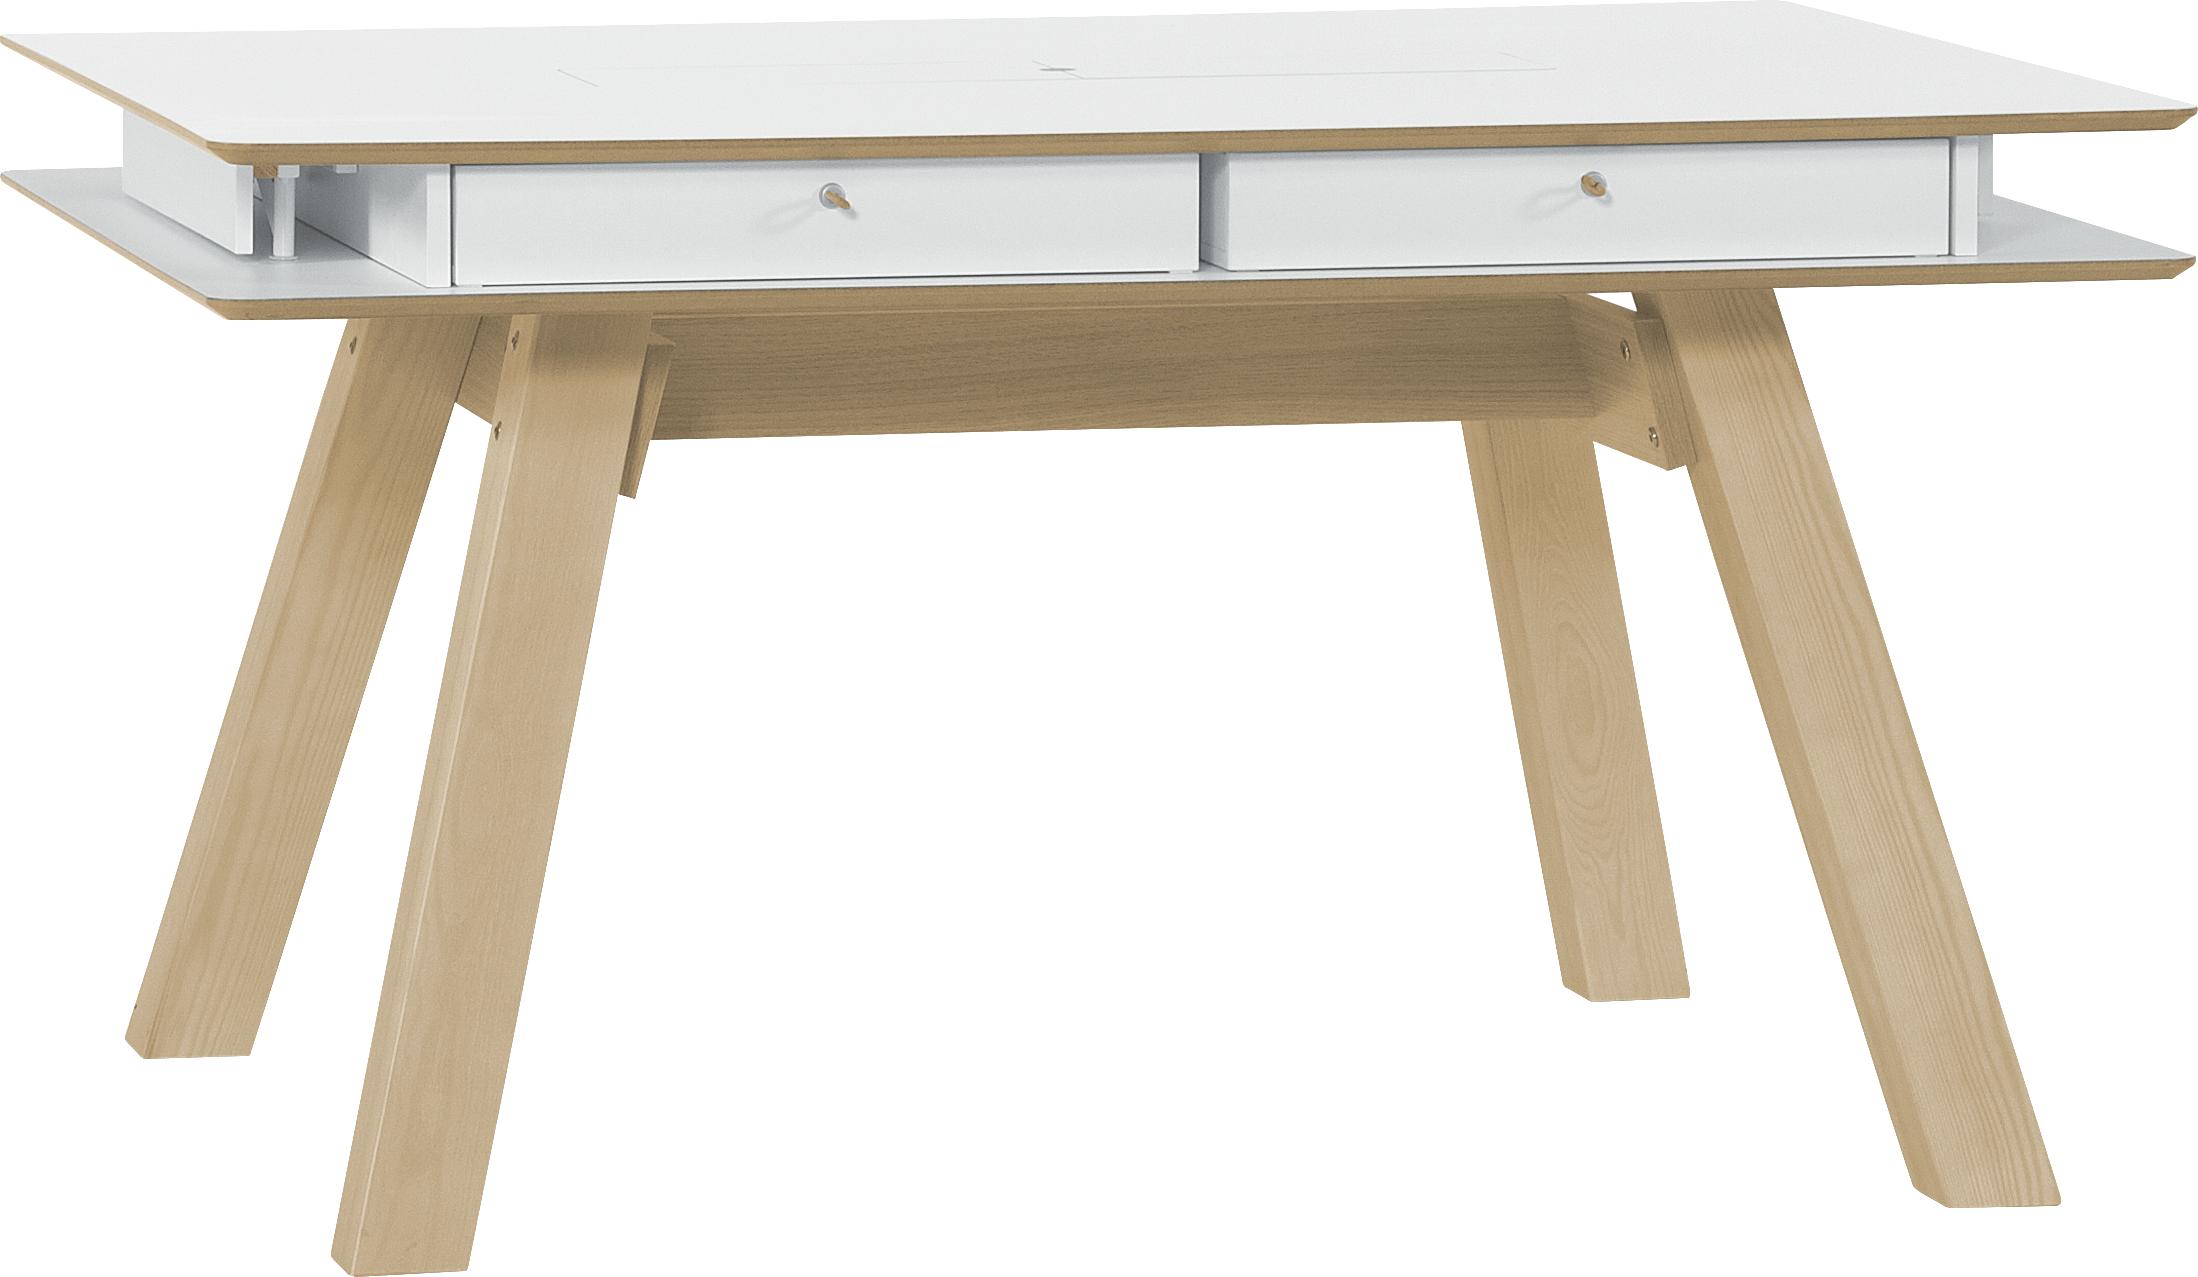 Stol Rozkladany Stol Vox Furniture Office Desk Table